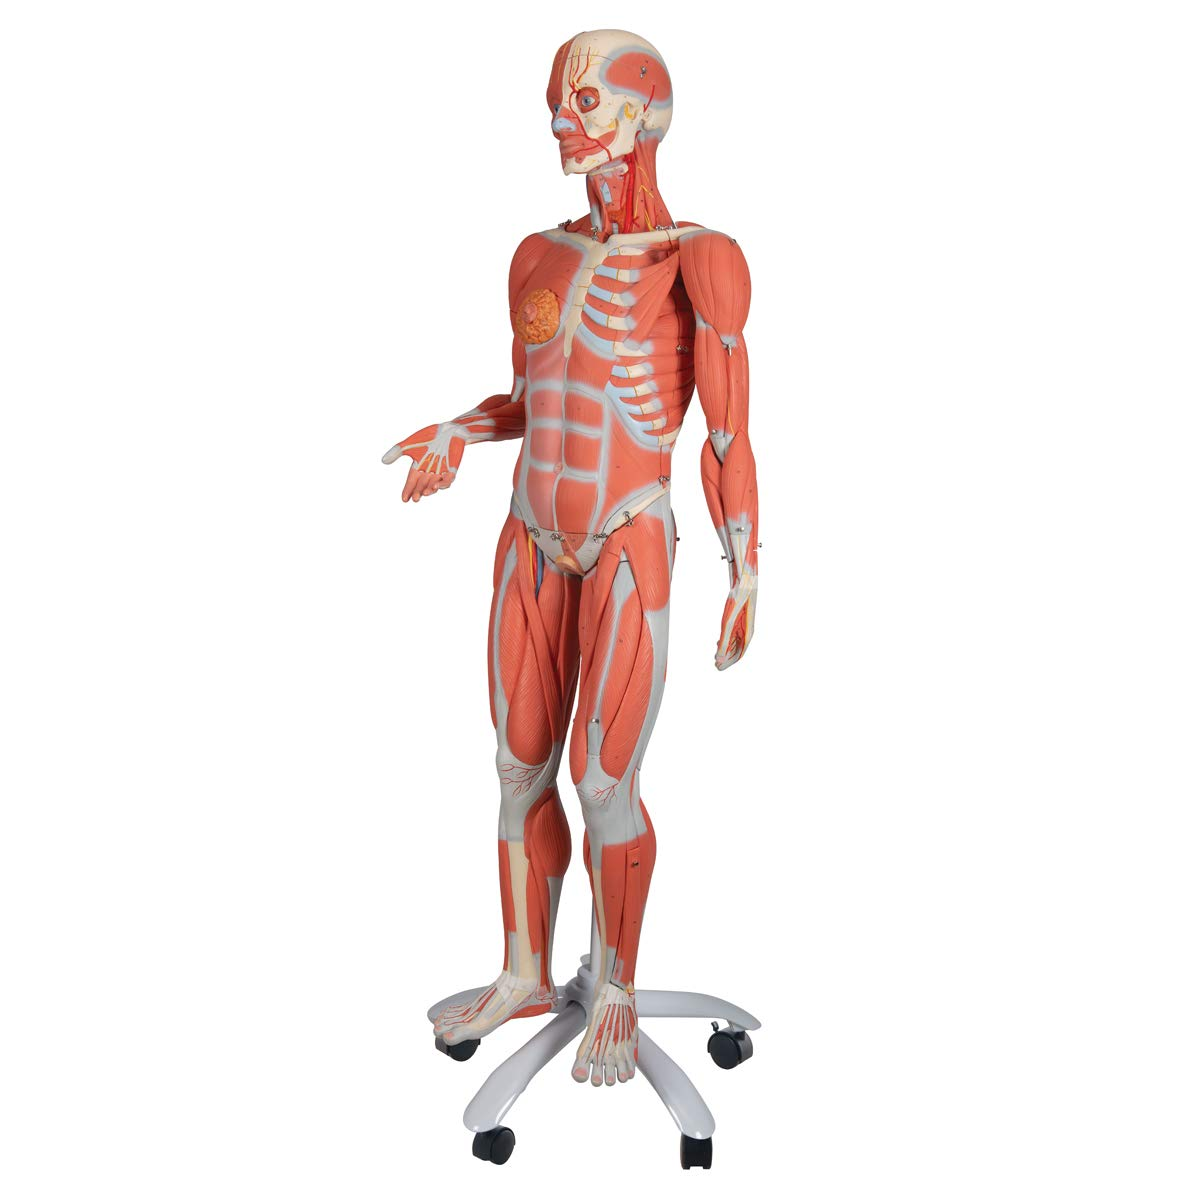 3b Scientific B51 23 Part 34 Life Size Female Muscle Figure Model